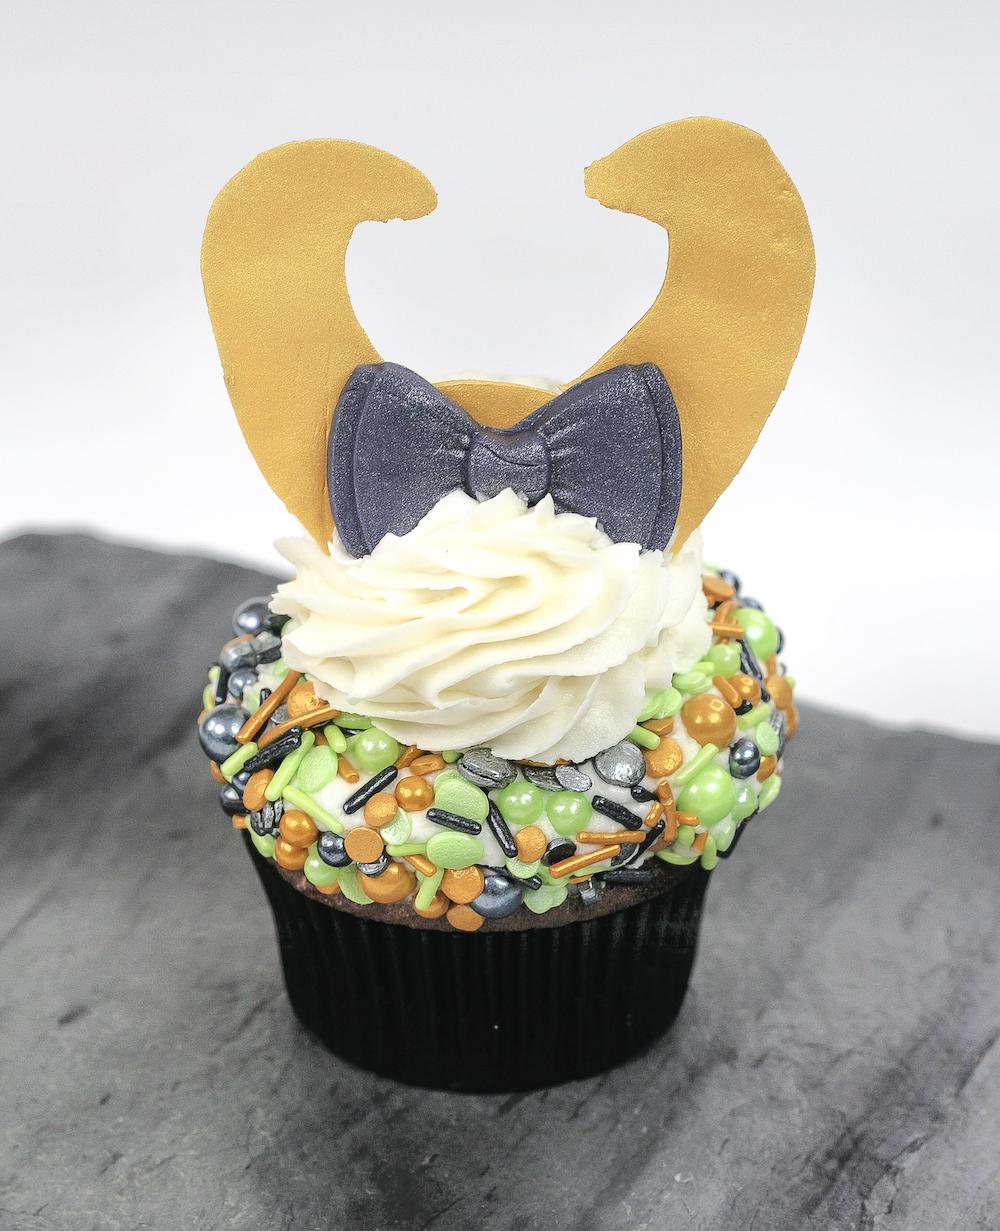 Loki Cupcake Step 4 add horns